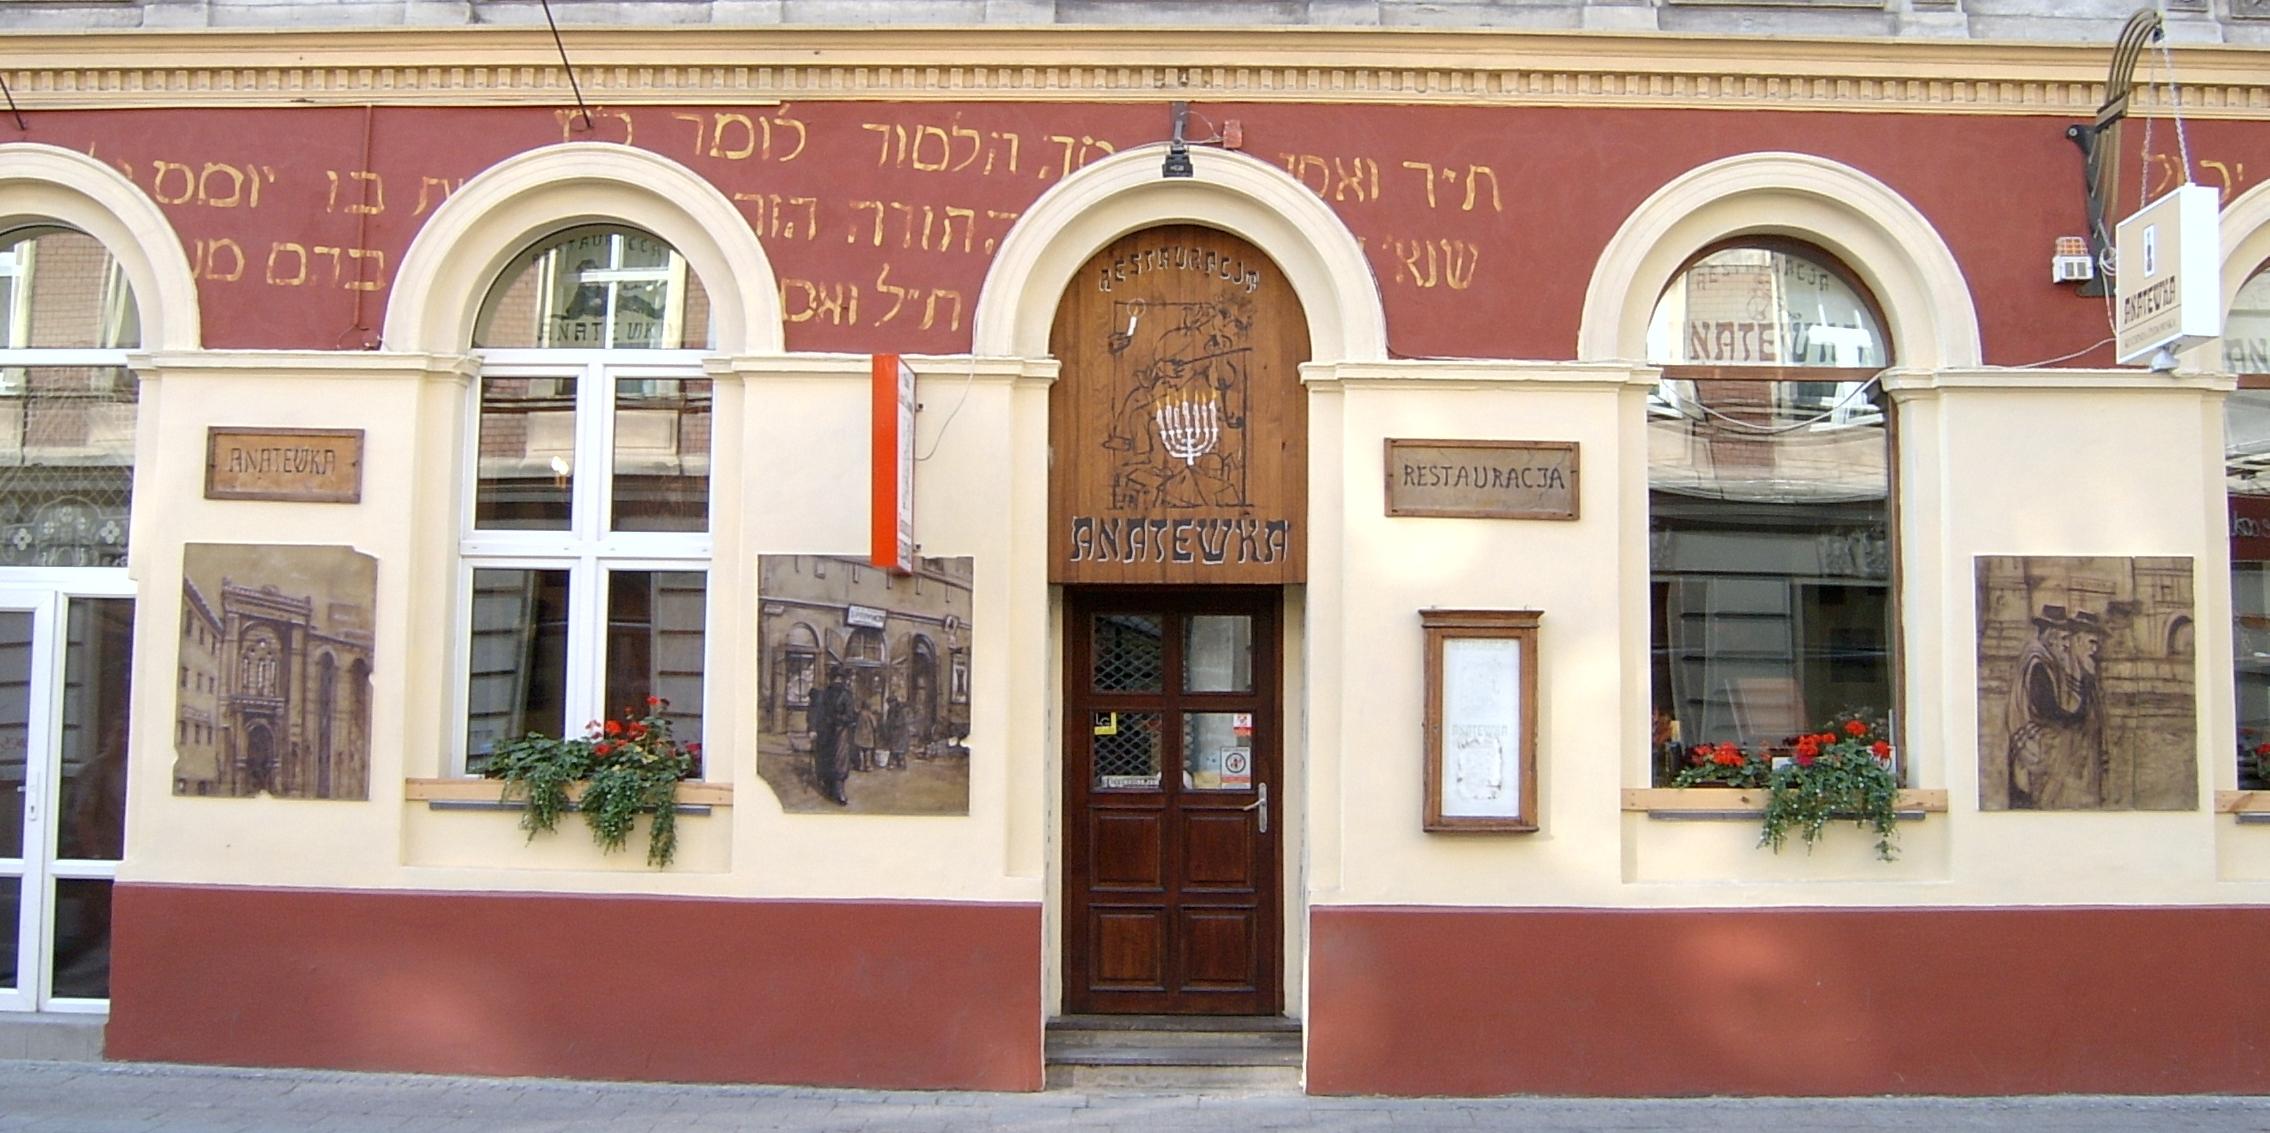 2005-09 Łódź - 6. Sierpnia 4 | © Sicherlich/WikiCommons